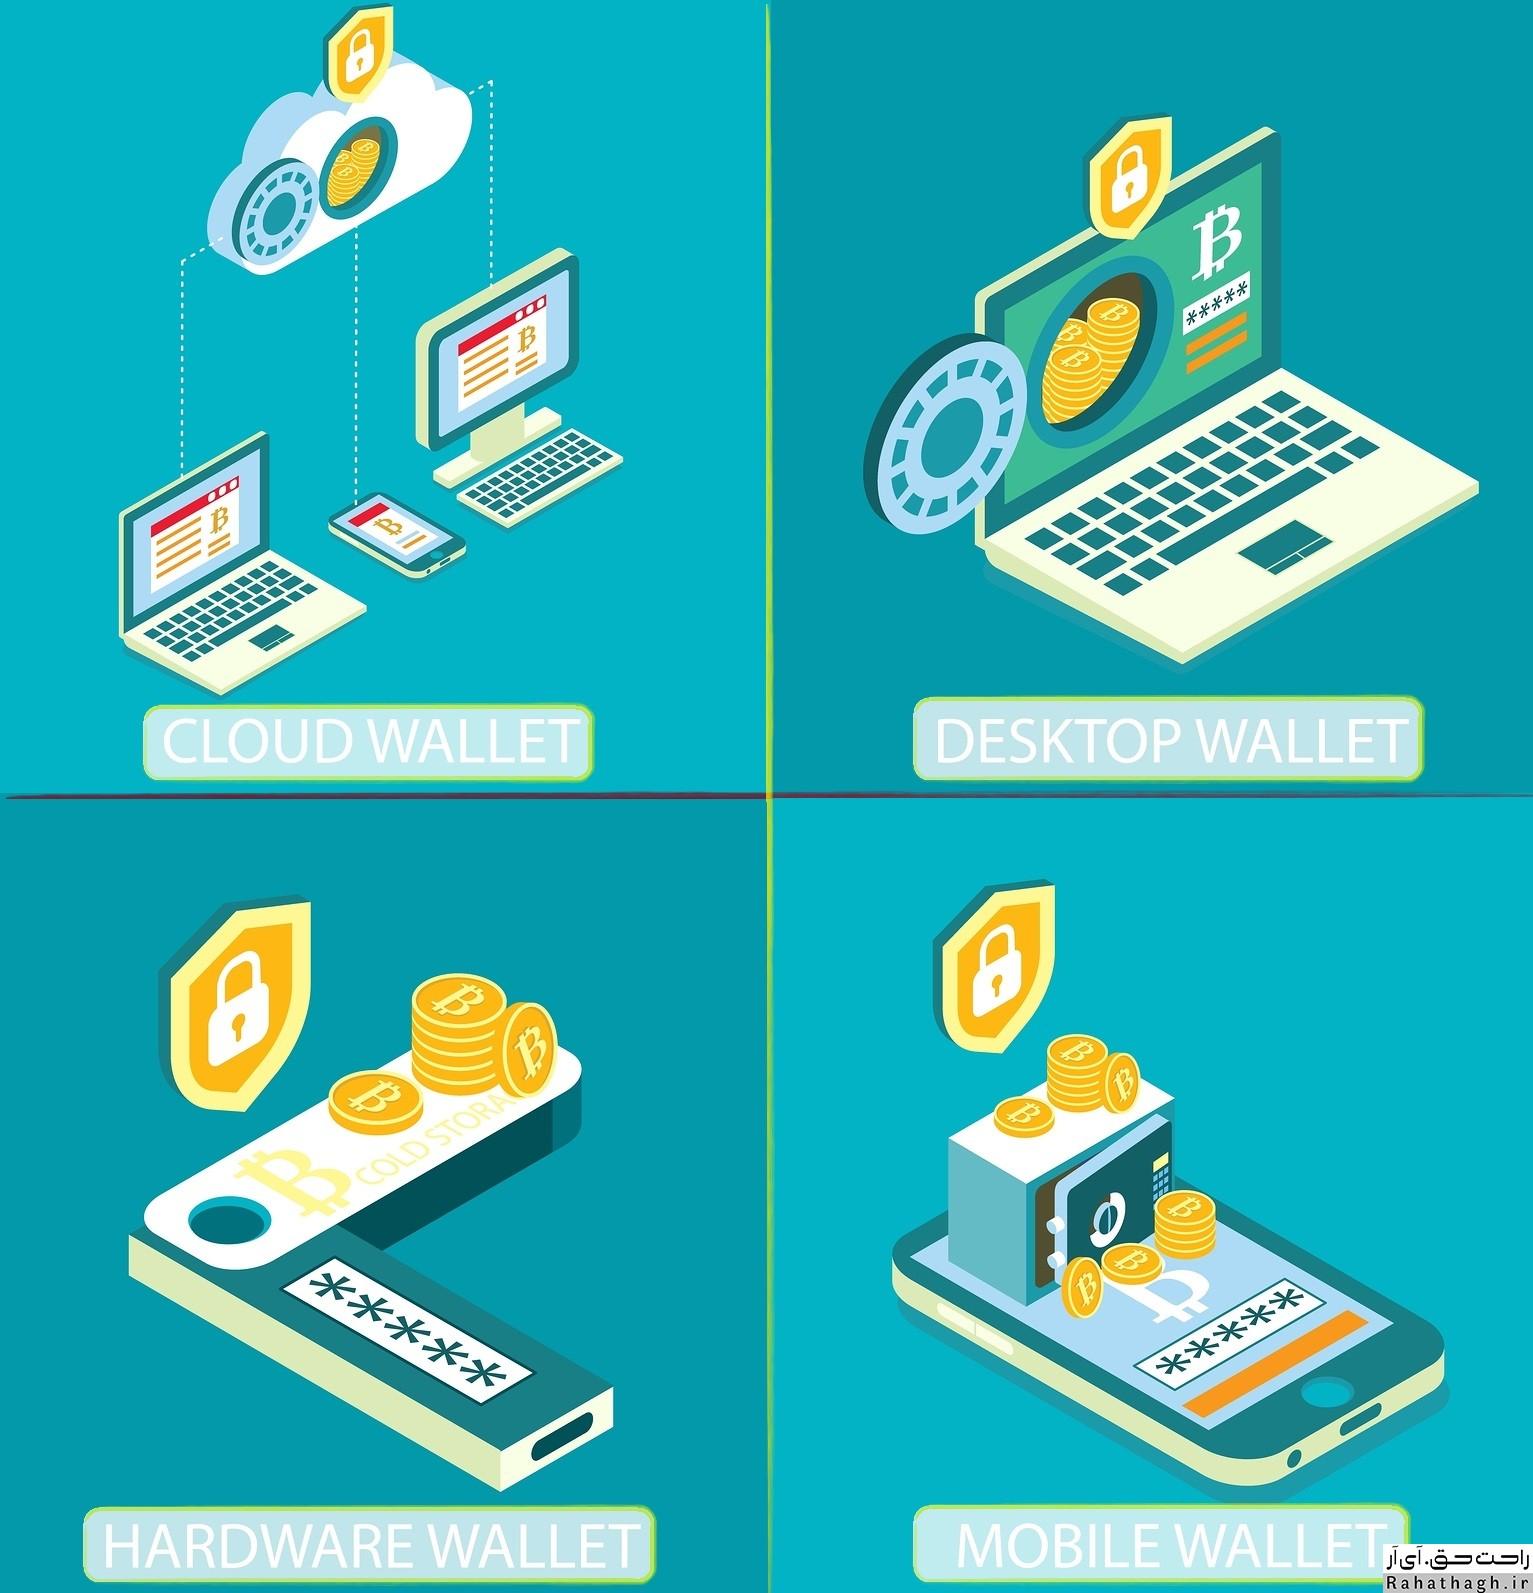 https://bayanbox.ir/view/8053542718070875840/Cryptocurrency-Wallet-%D8%B1%D8%A7%D8%AD%D8%AA-%D8%AD%D9%82.jpg